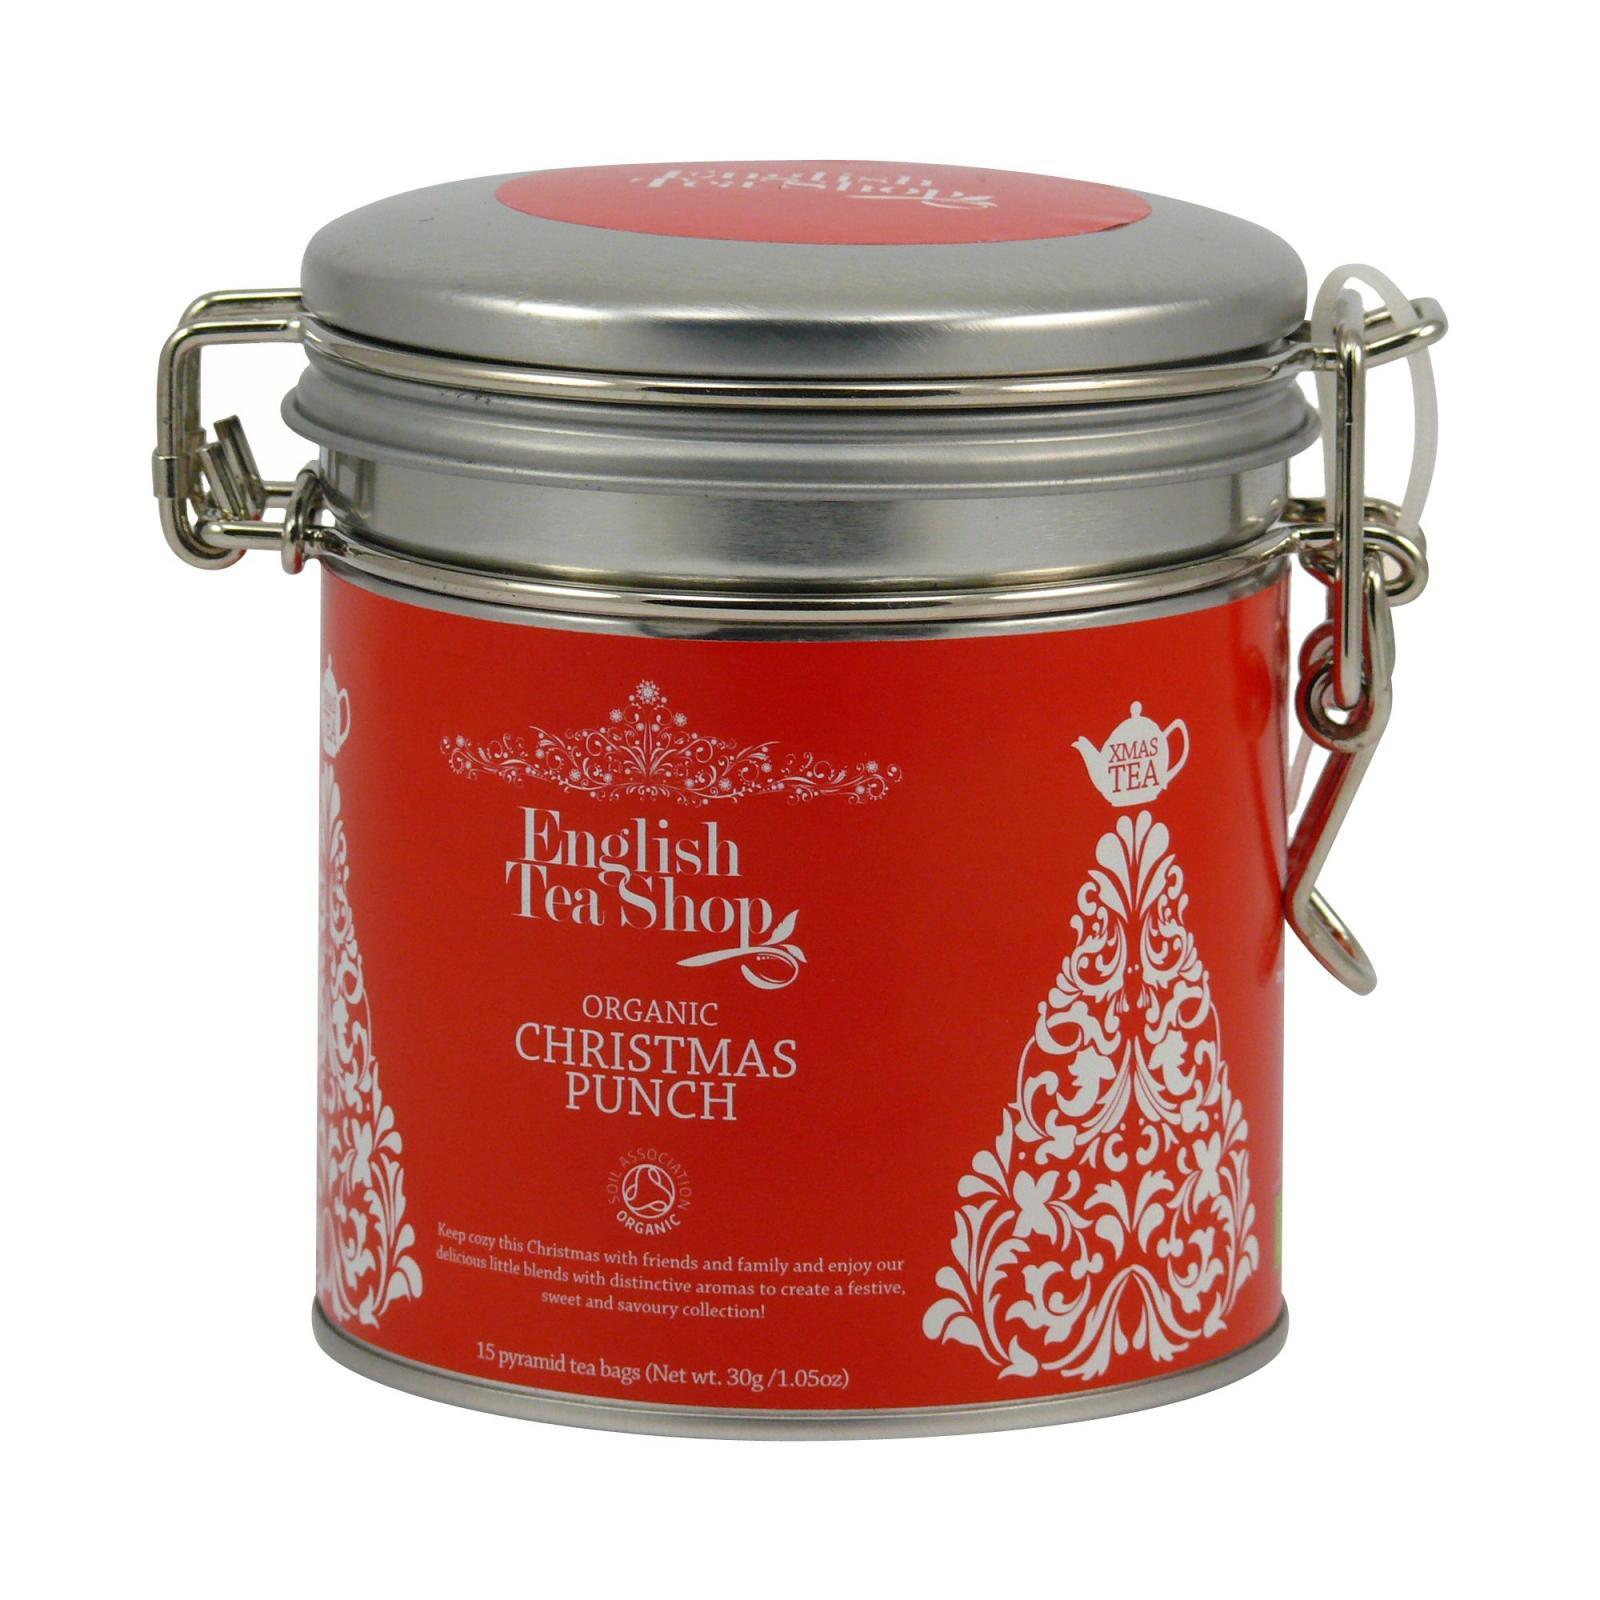 English Tea Shop Vánoční punč, plechová kazeta 30 g, 15 ks